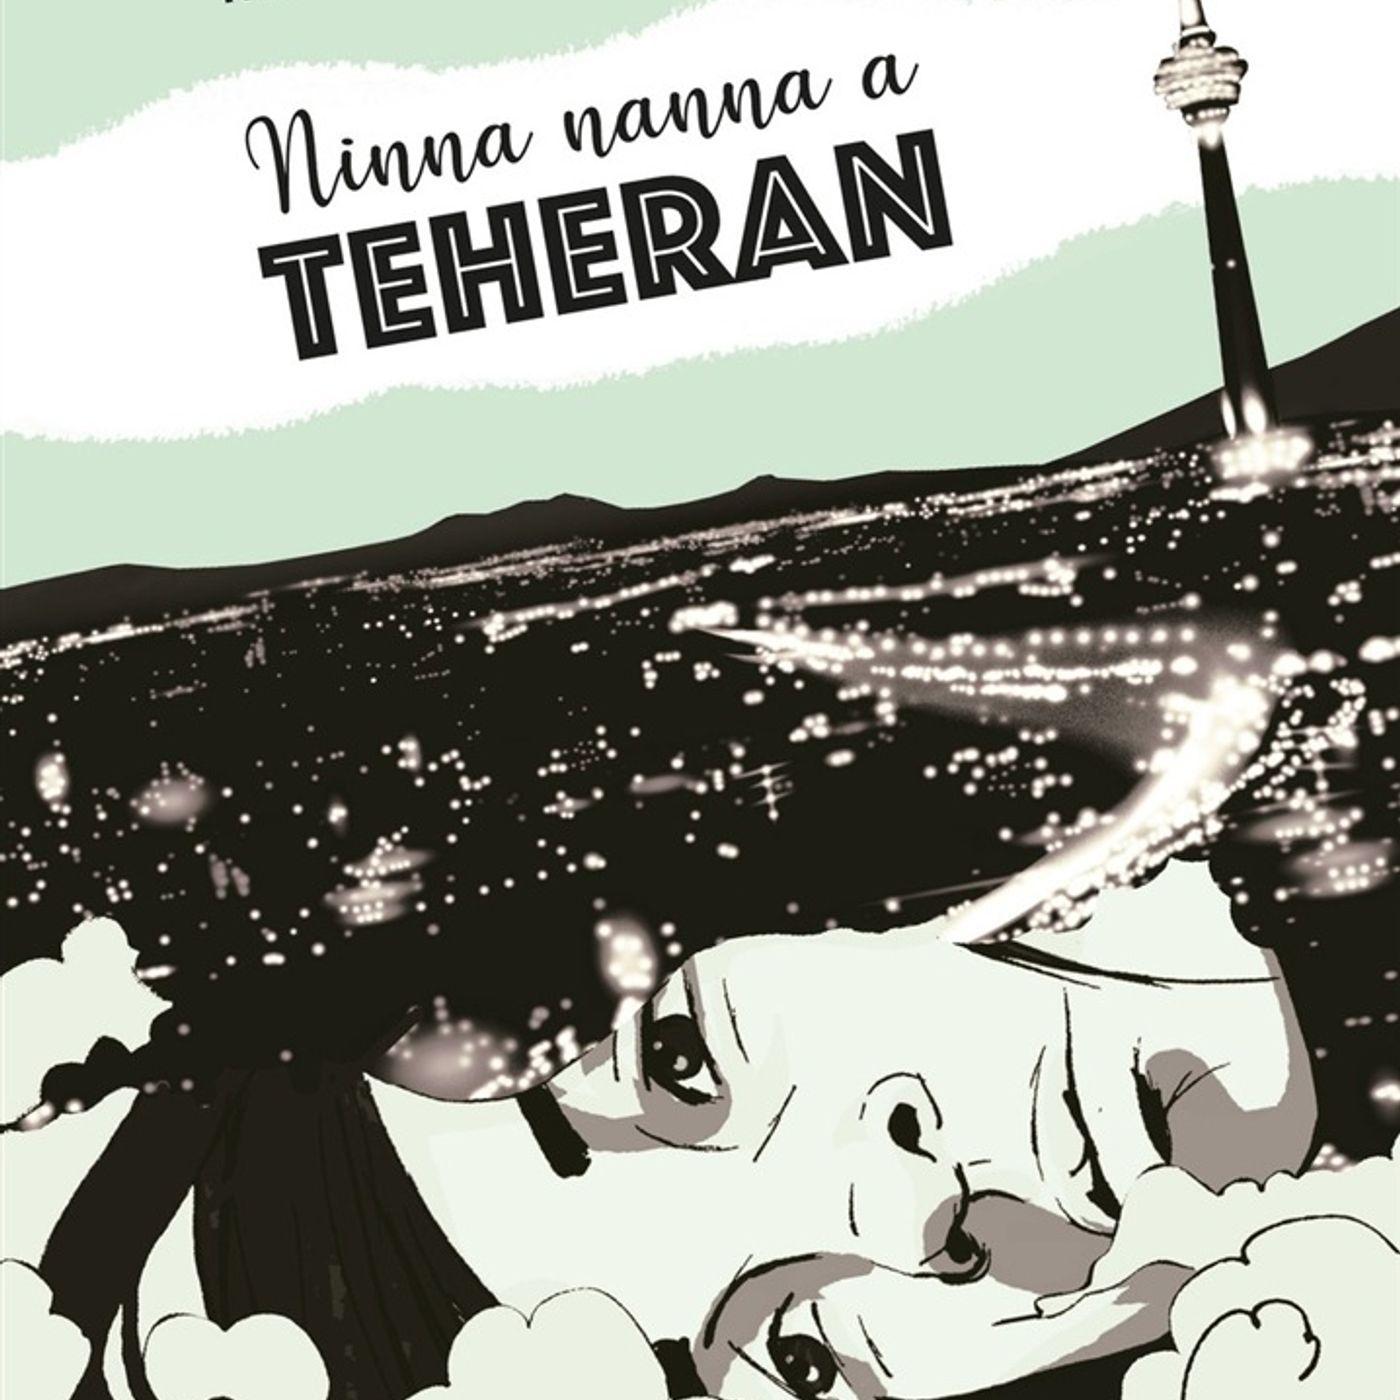 [Esordi] Ninna nanna a Teheran di Nassim Honaryar